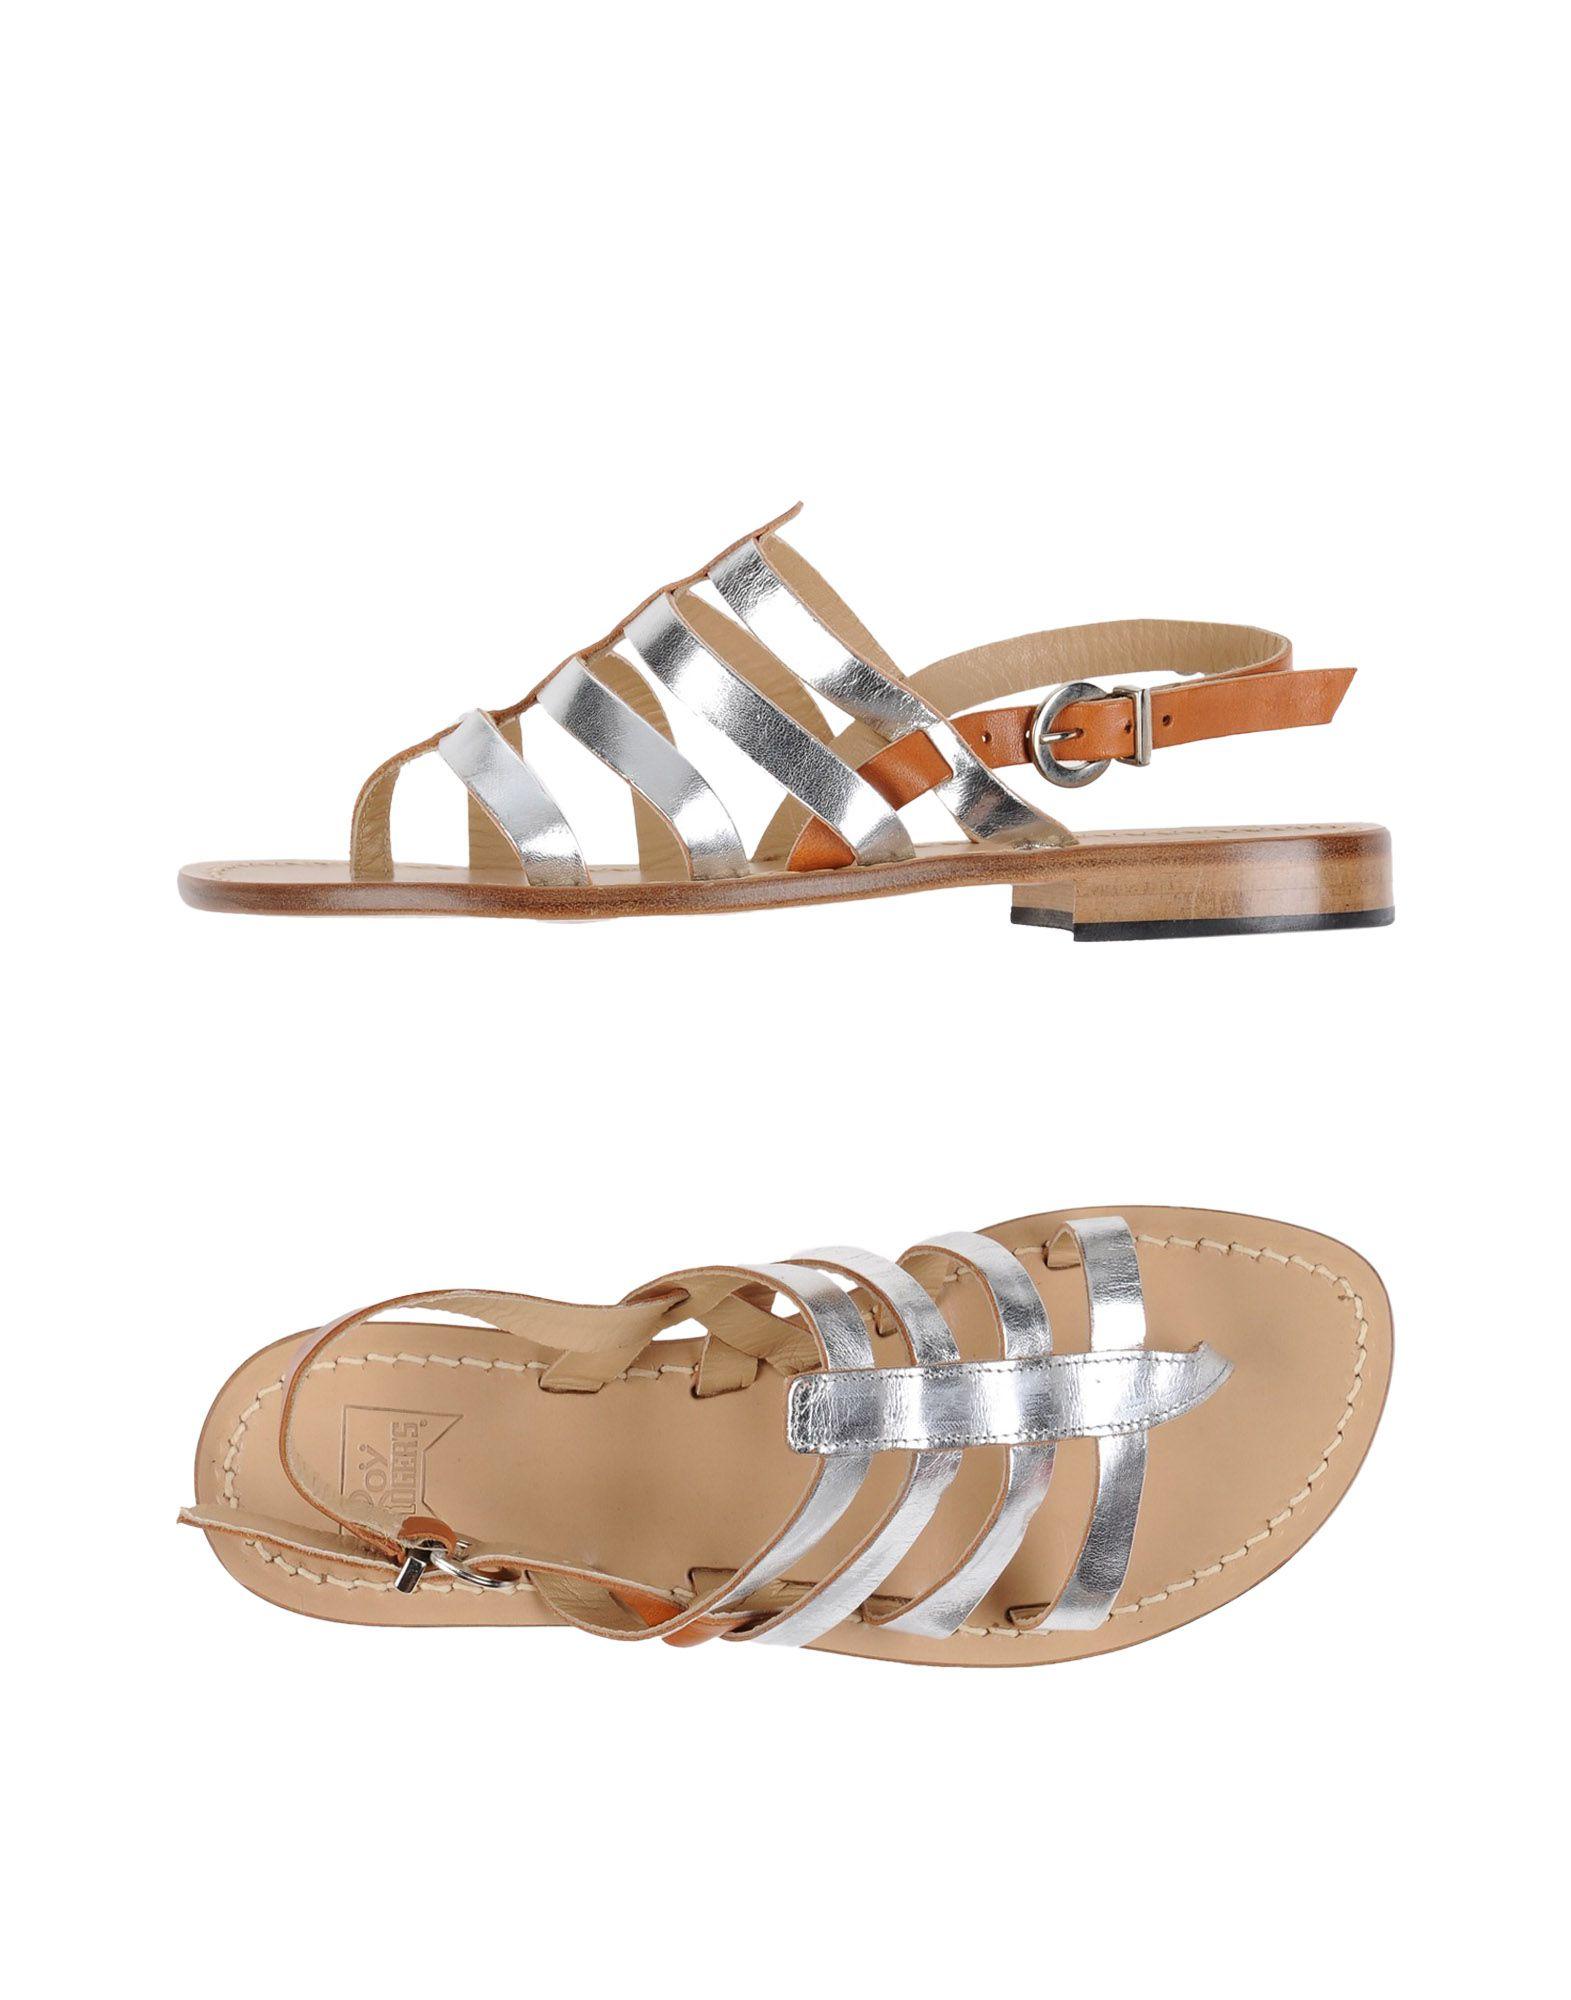 Roÿ Roger's Dianetten Damen  11156801NE Gute Qualität beliebte Schuhe